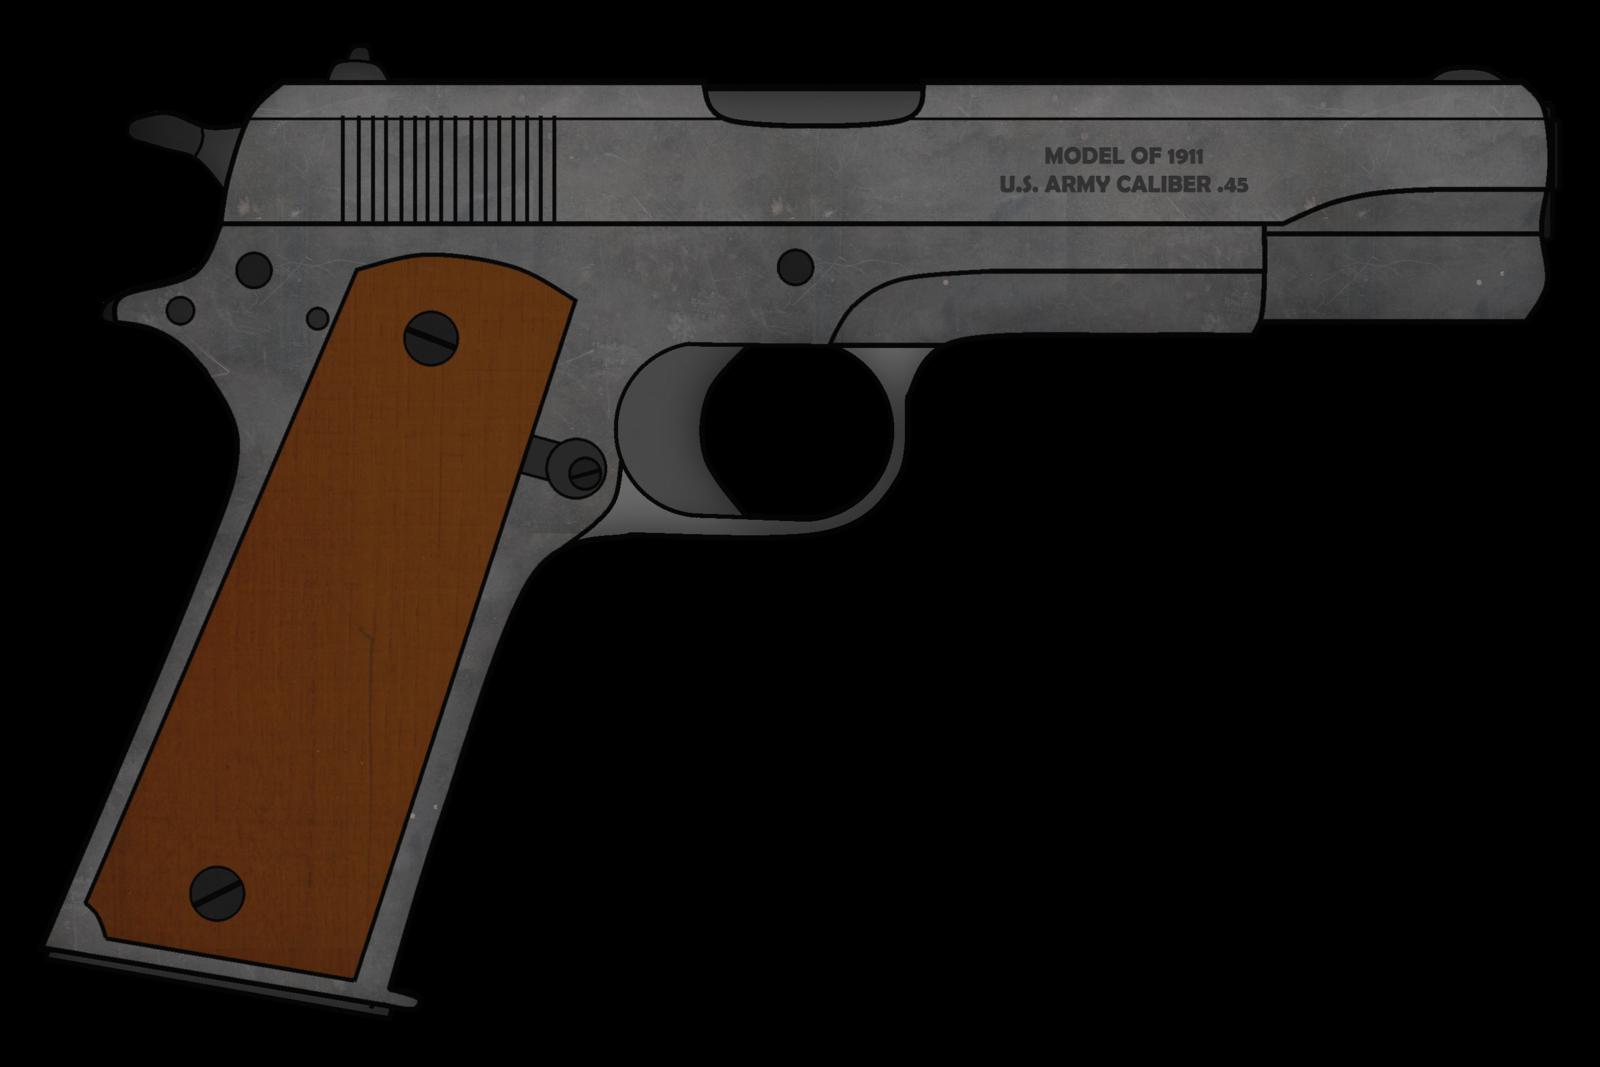 Clipart gun m1911. Colt m by skorpion